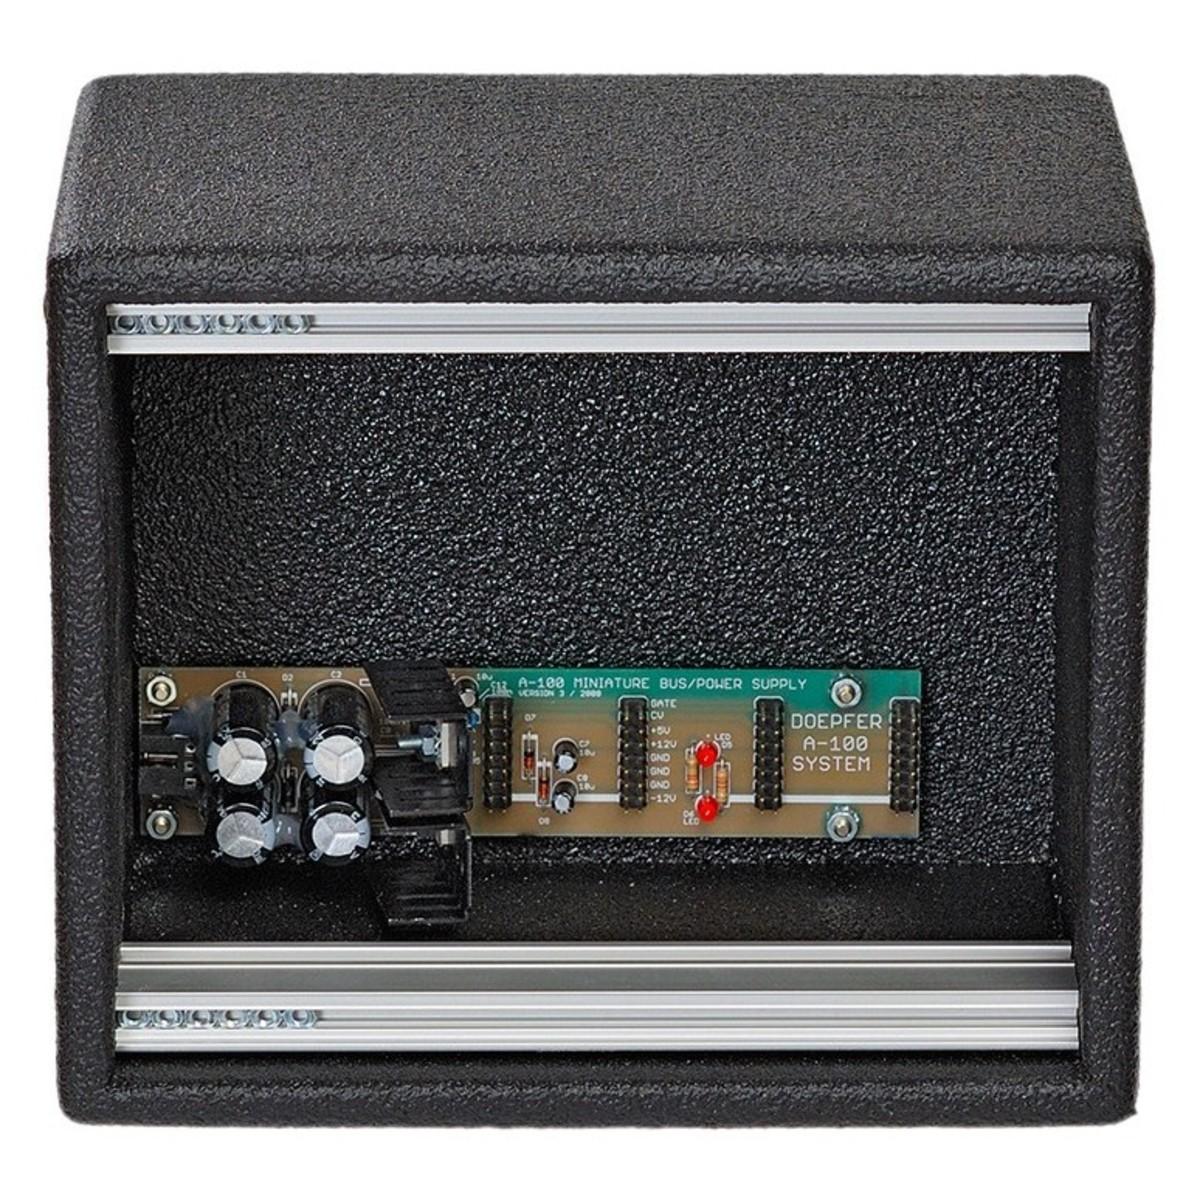 Doepfer A-100MC Mini Case, Black at Gear4music